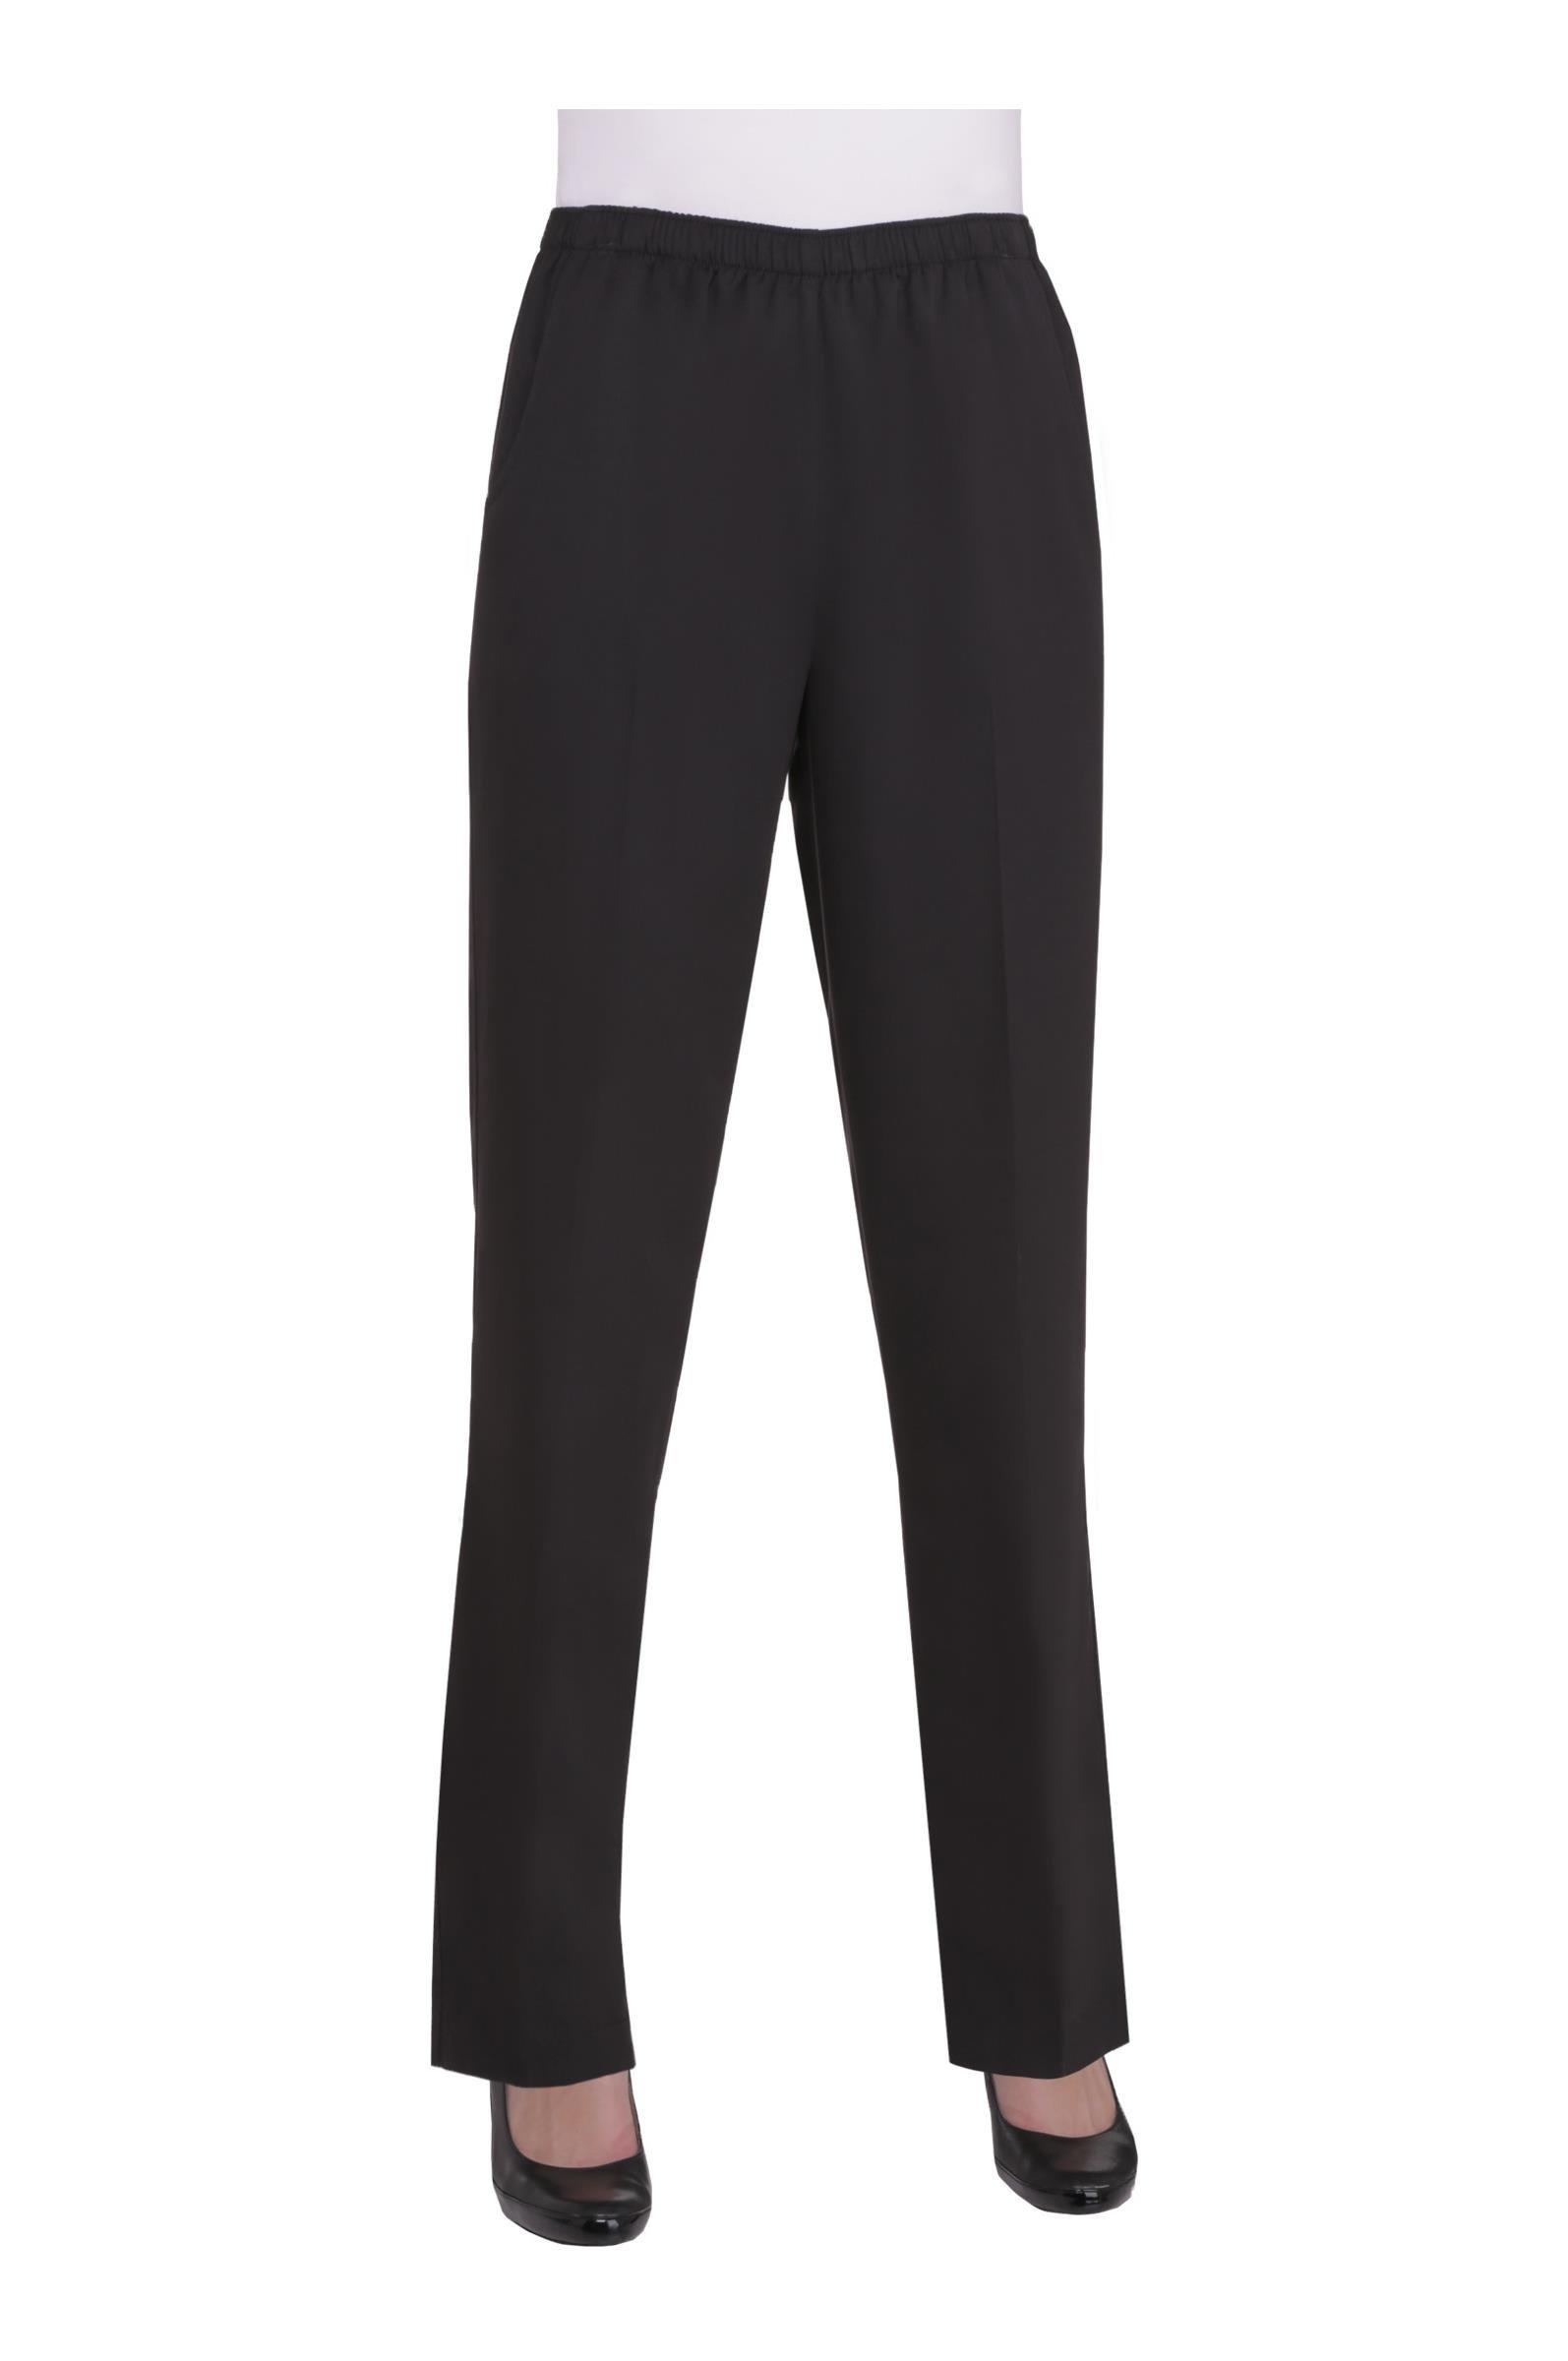 Alia Nygard Women's Petite Microfiber Twill Pull-On Pant